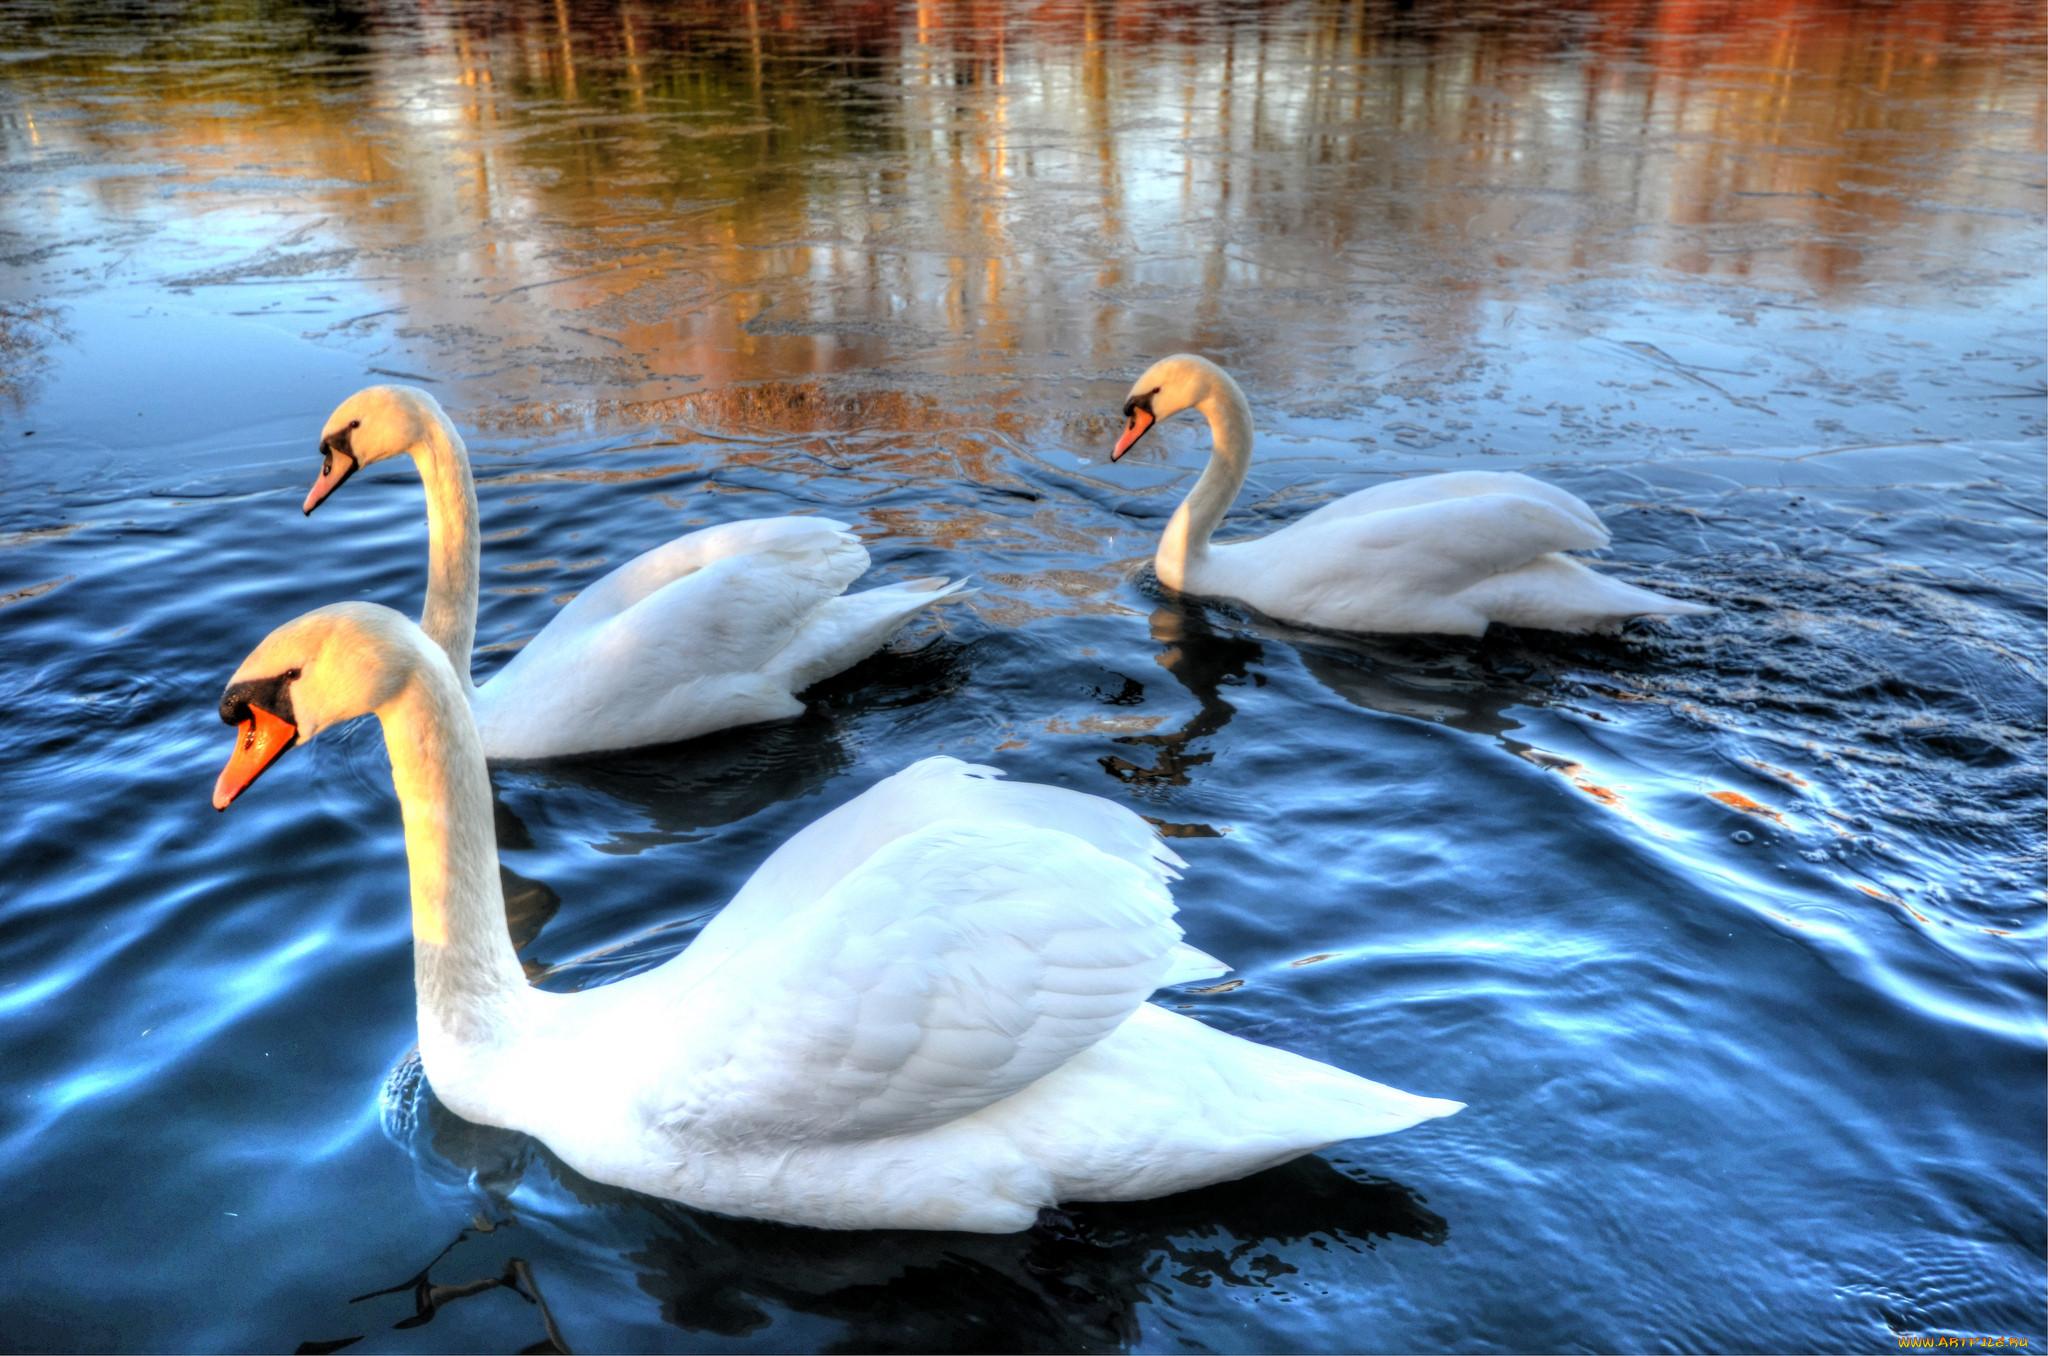 Картинки с тремя лебедями